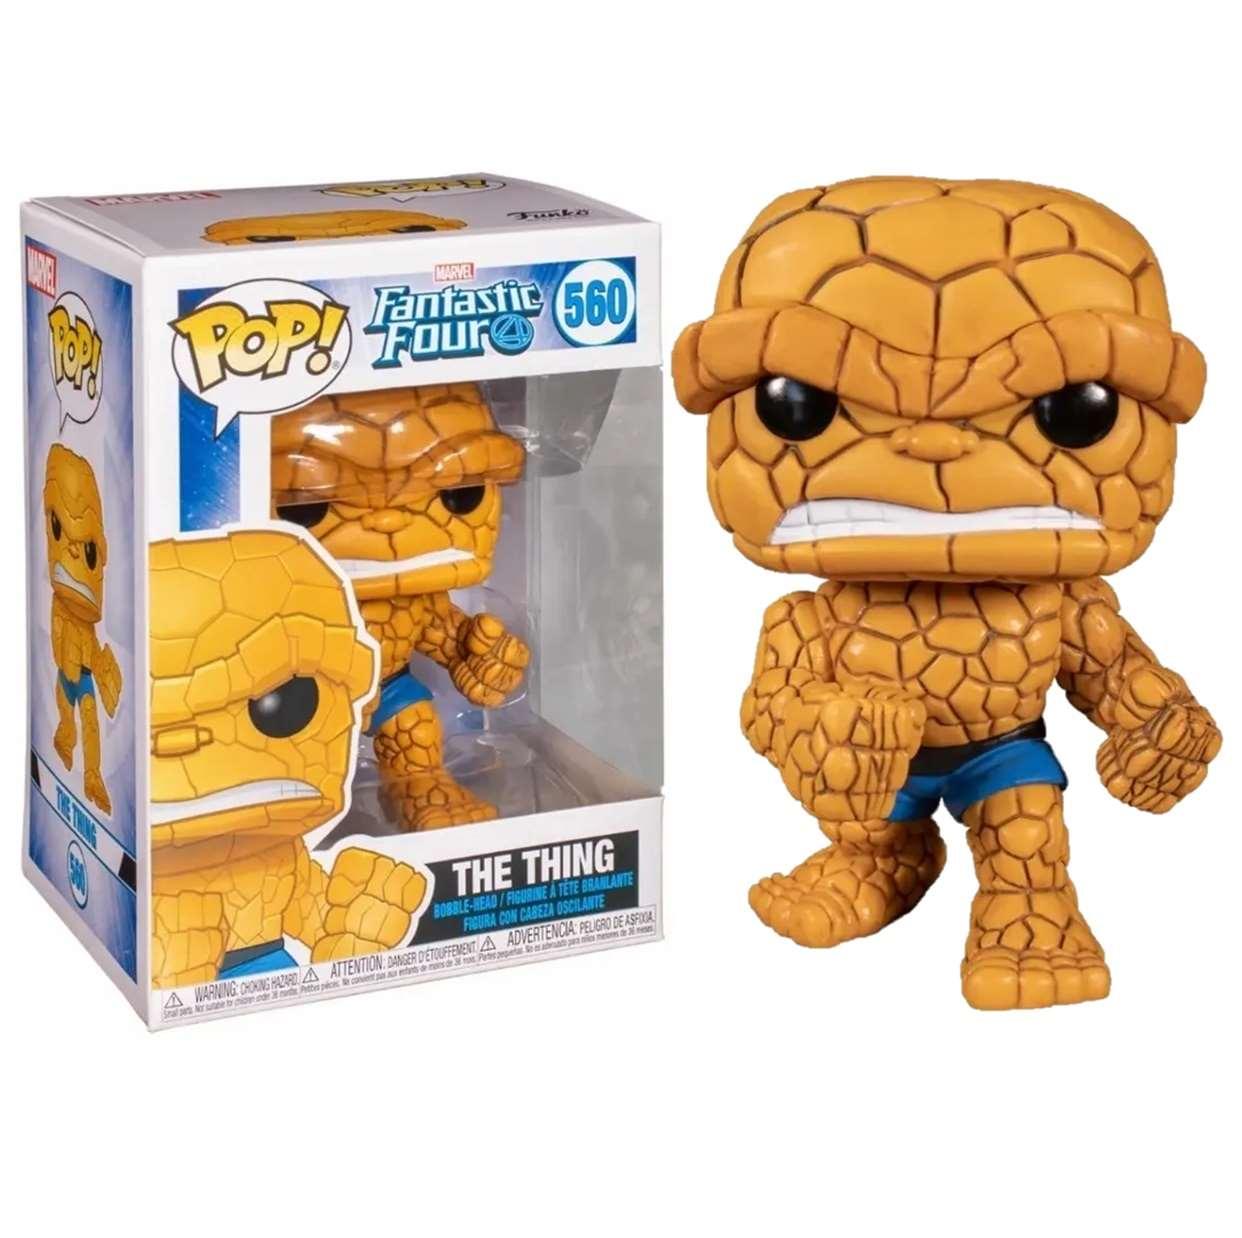 The Thing ( La Mole ) #560 Figura Fantastic Four Funko Pop!